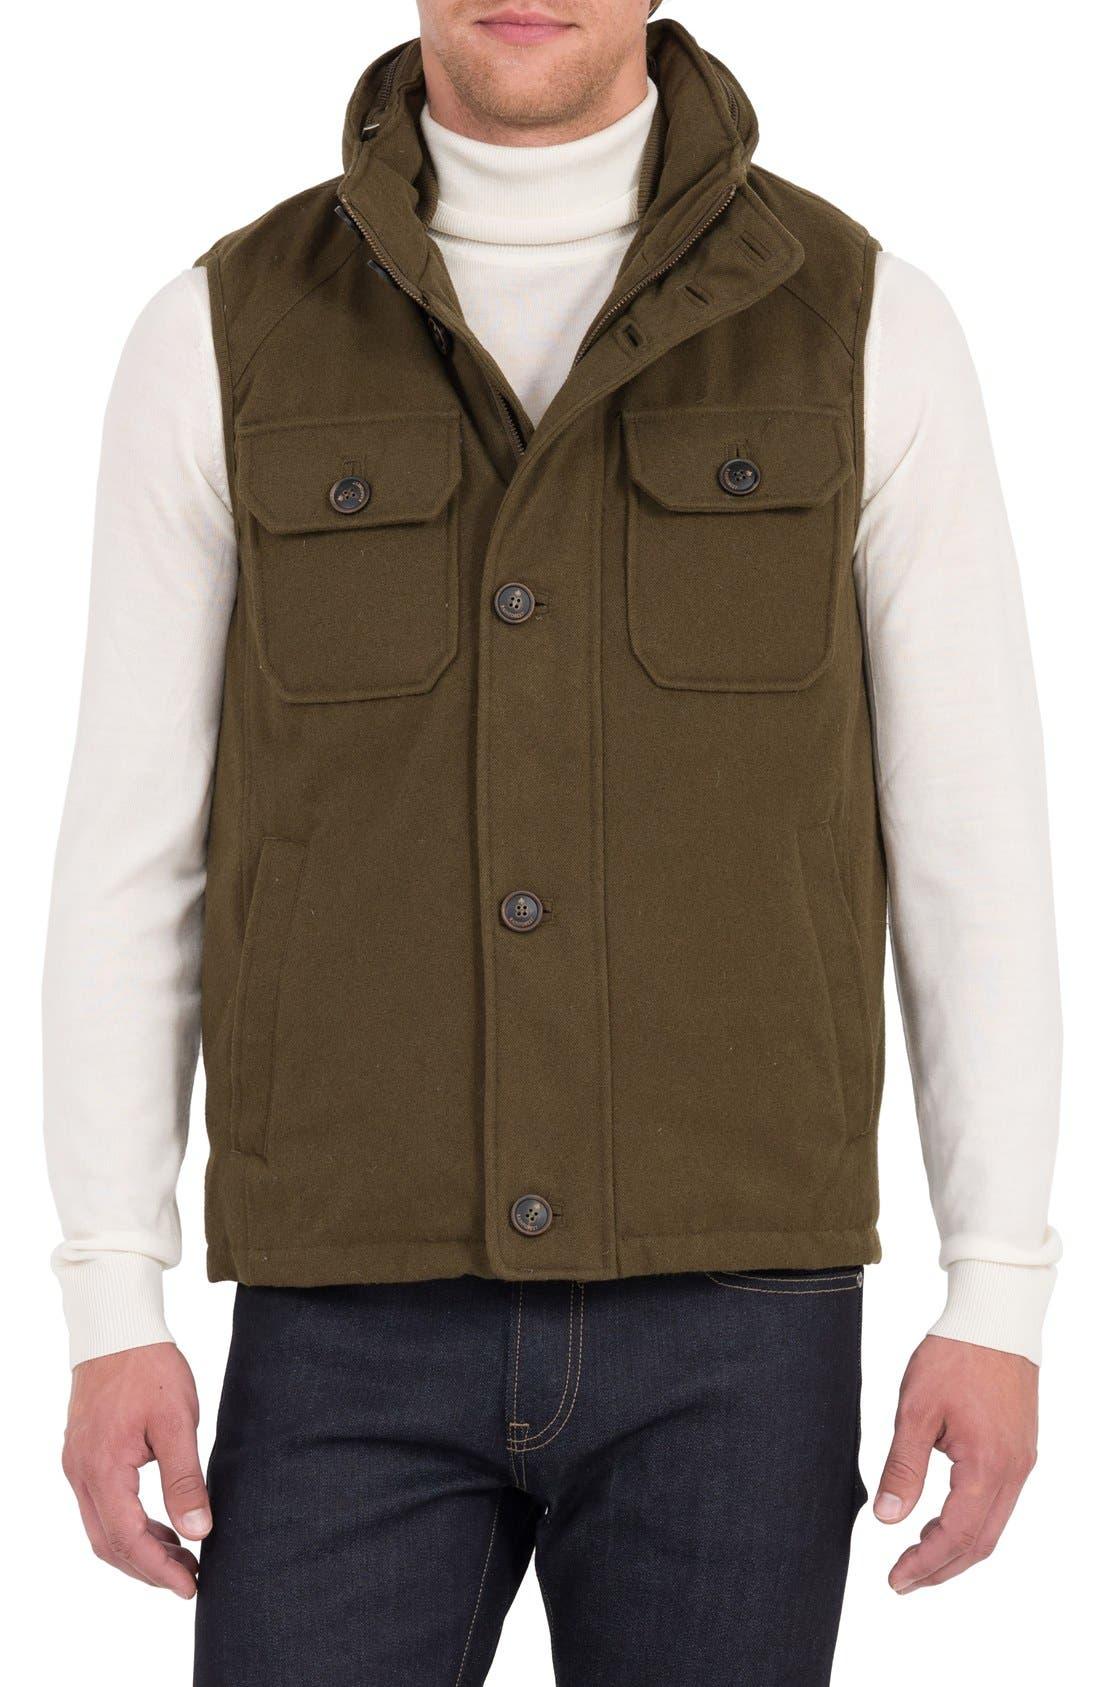 Rainforest Water Resistant Down Vest with Stowaway Hood